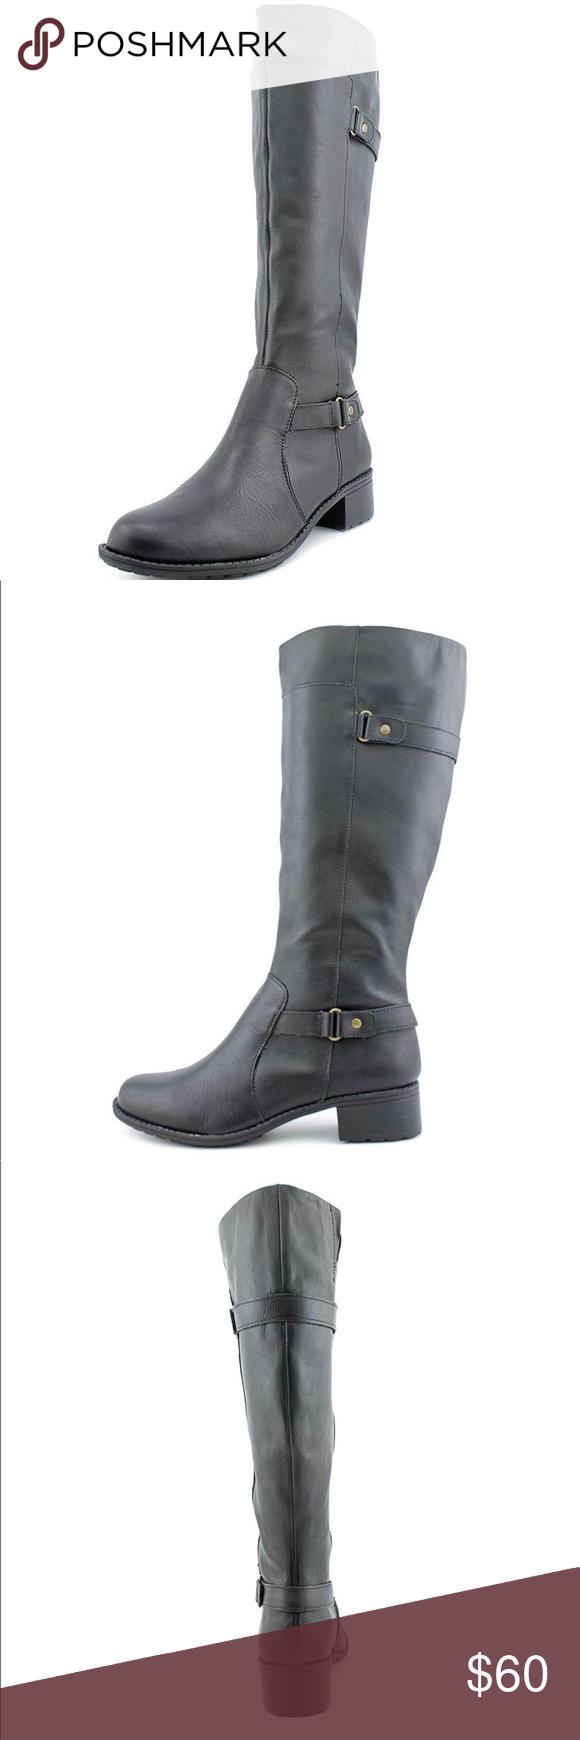 c664fdf95f6 Easy Spirit Labarca Tall Knee High Riding Boots Easy Spirit Labarca Tall  Knee High Riding Boot